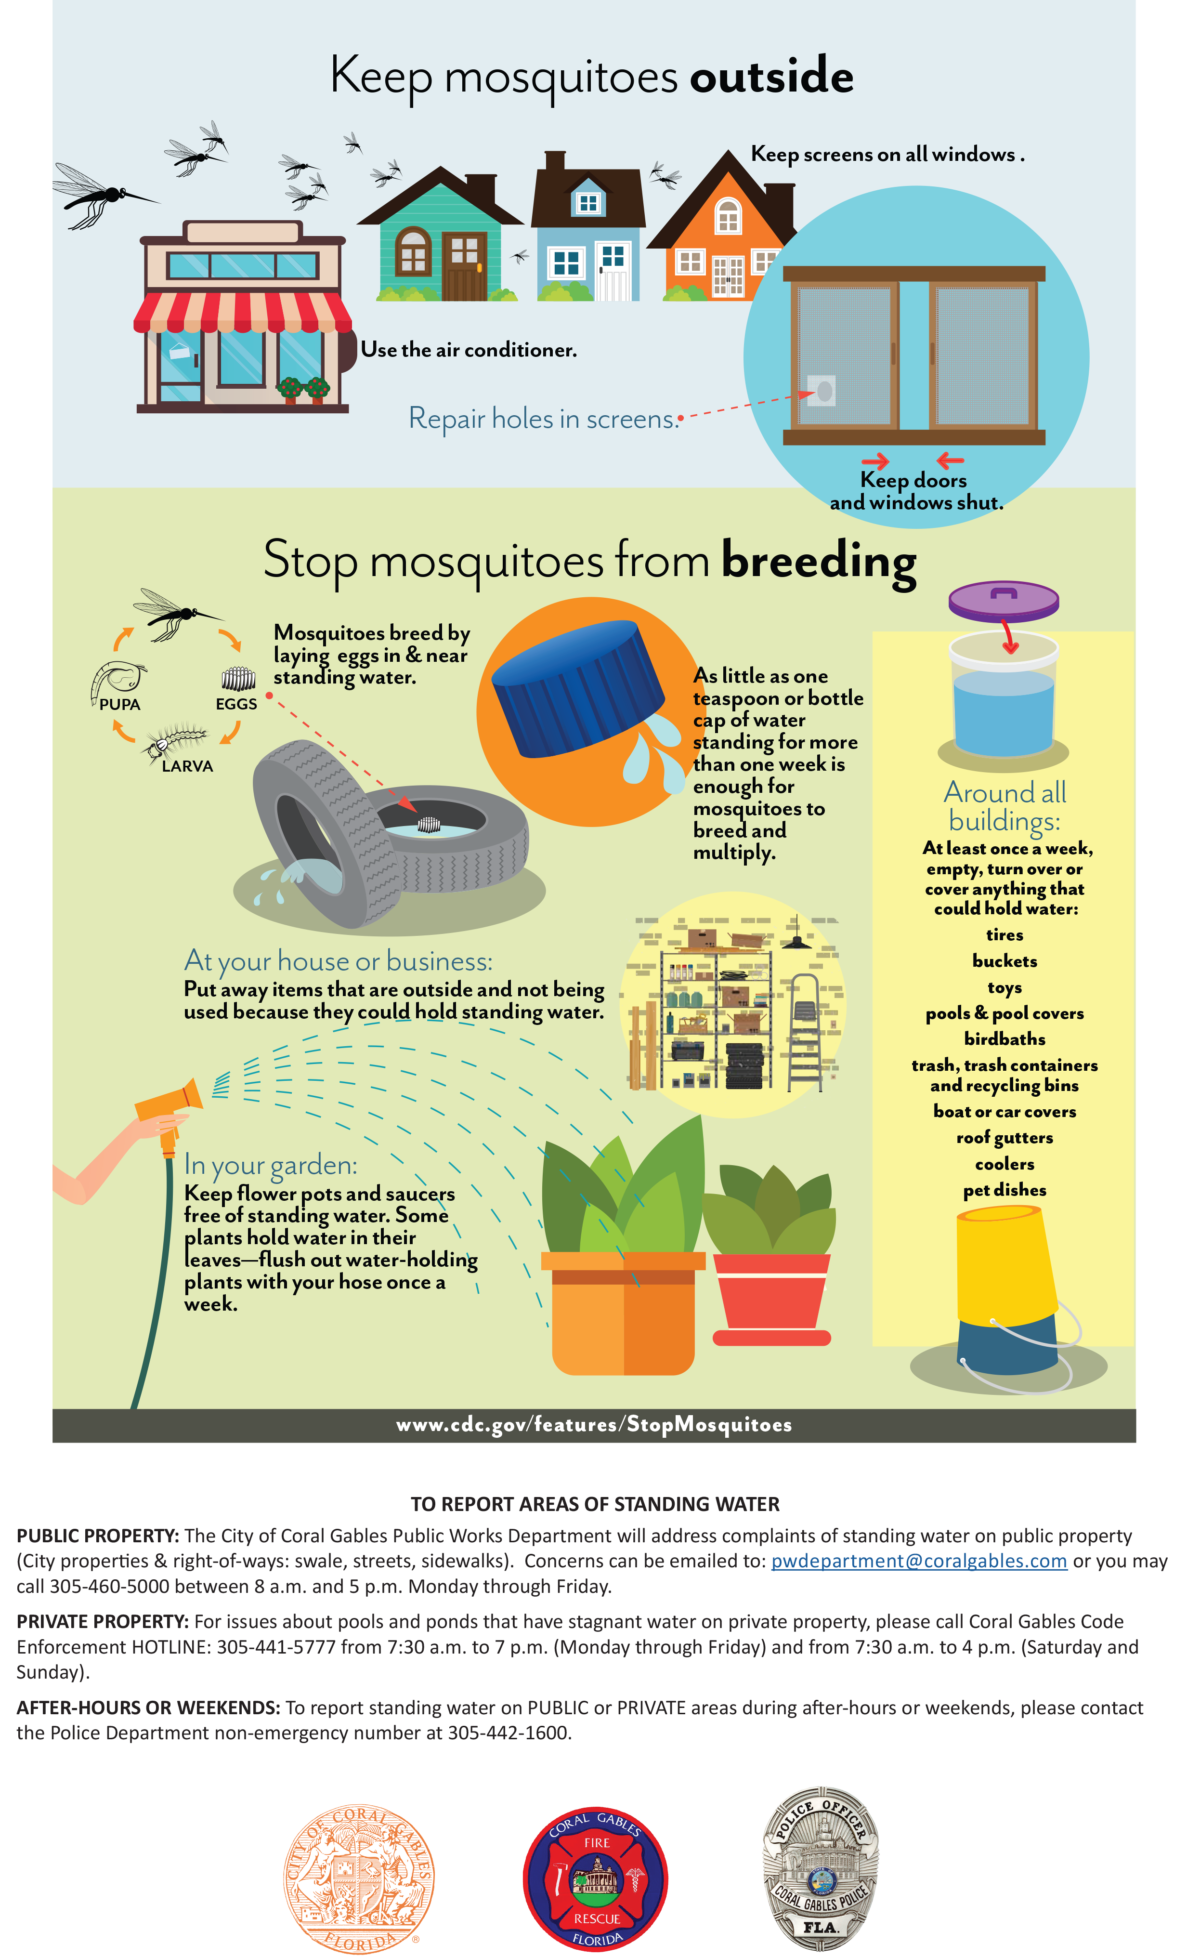 Coral Gables Zika Virus Advisory & Mosquito Bite Protection Flyer